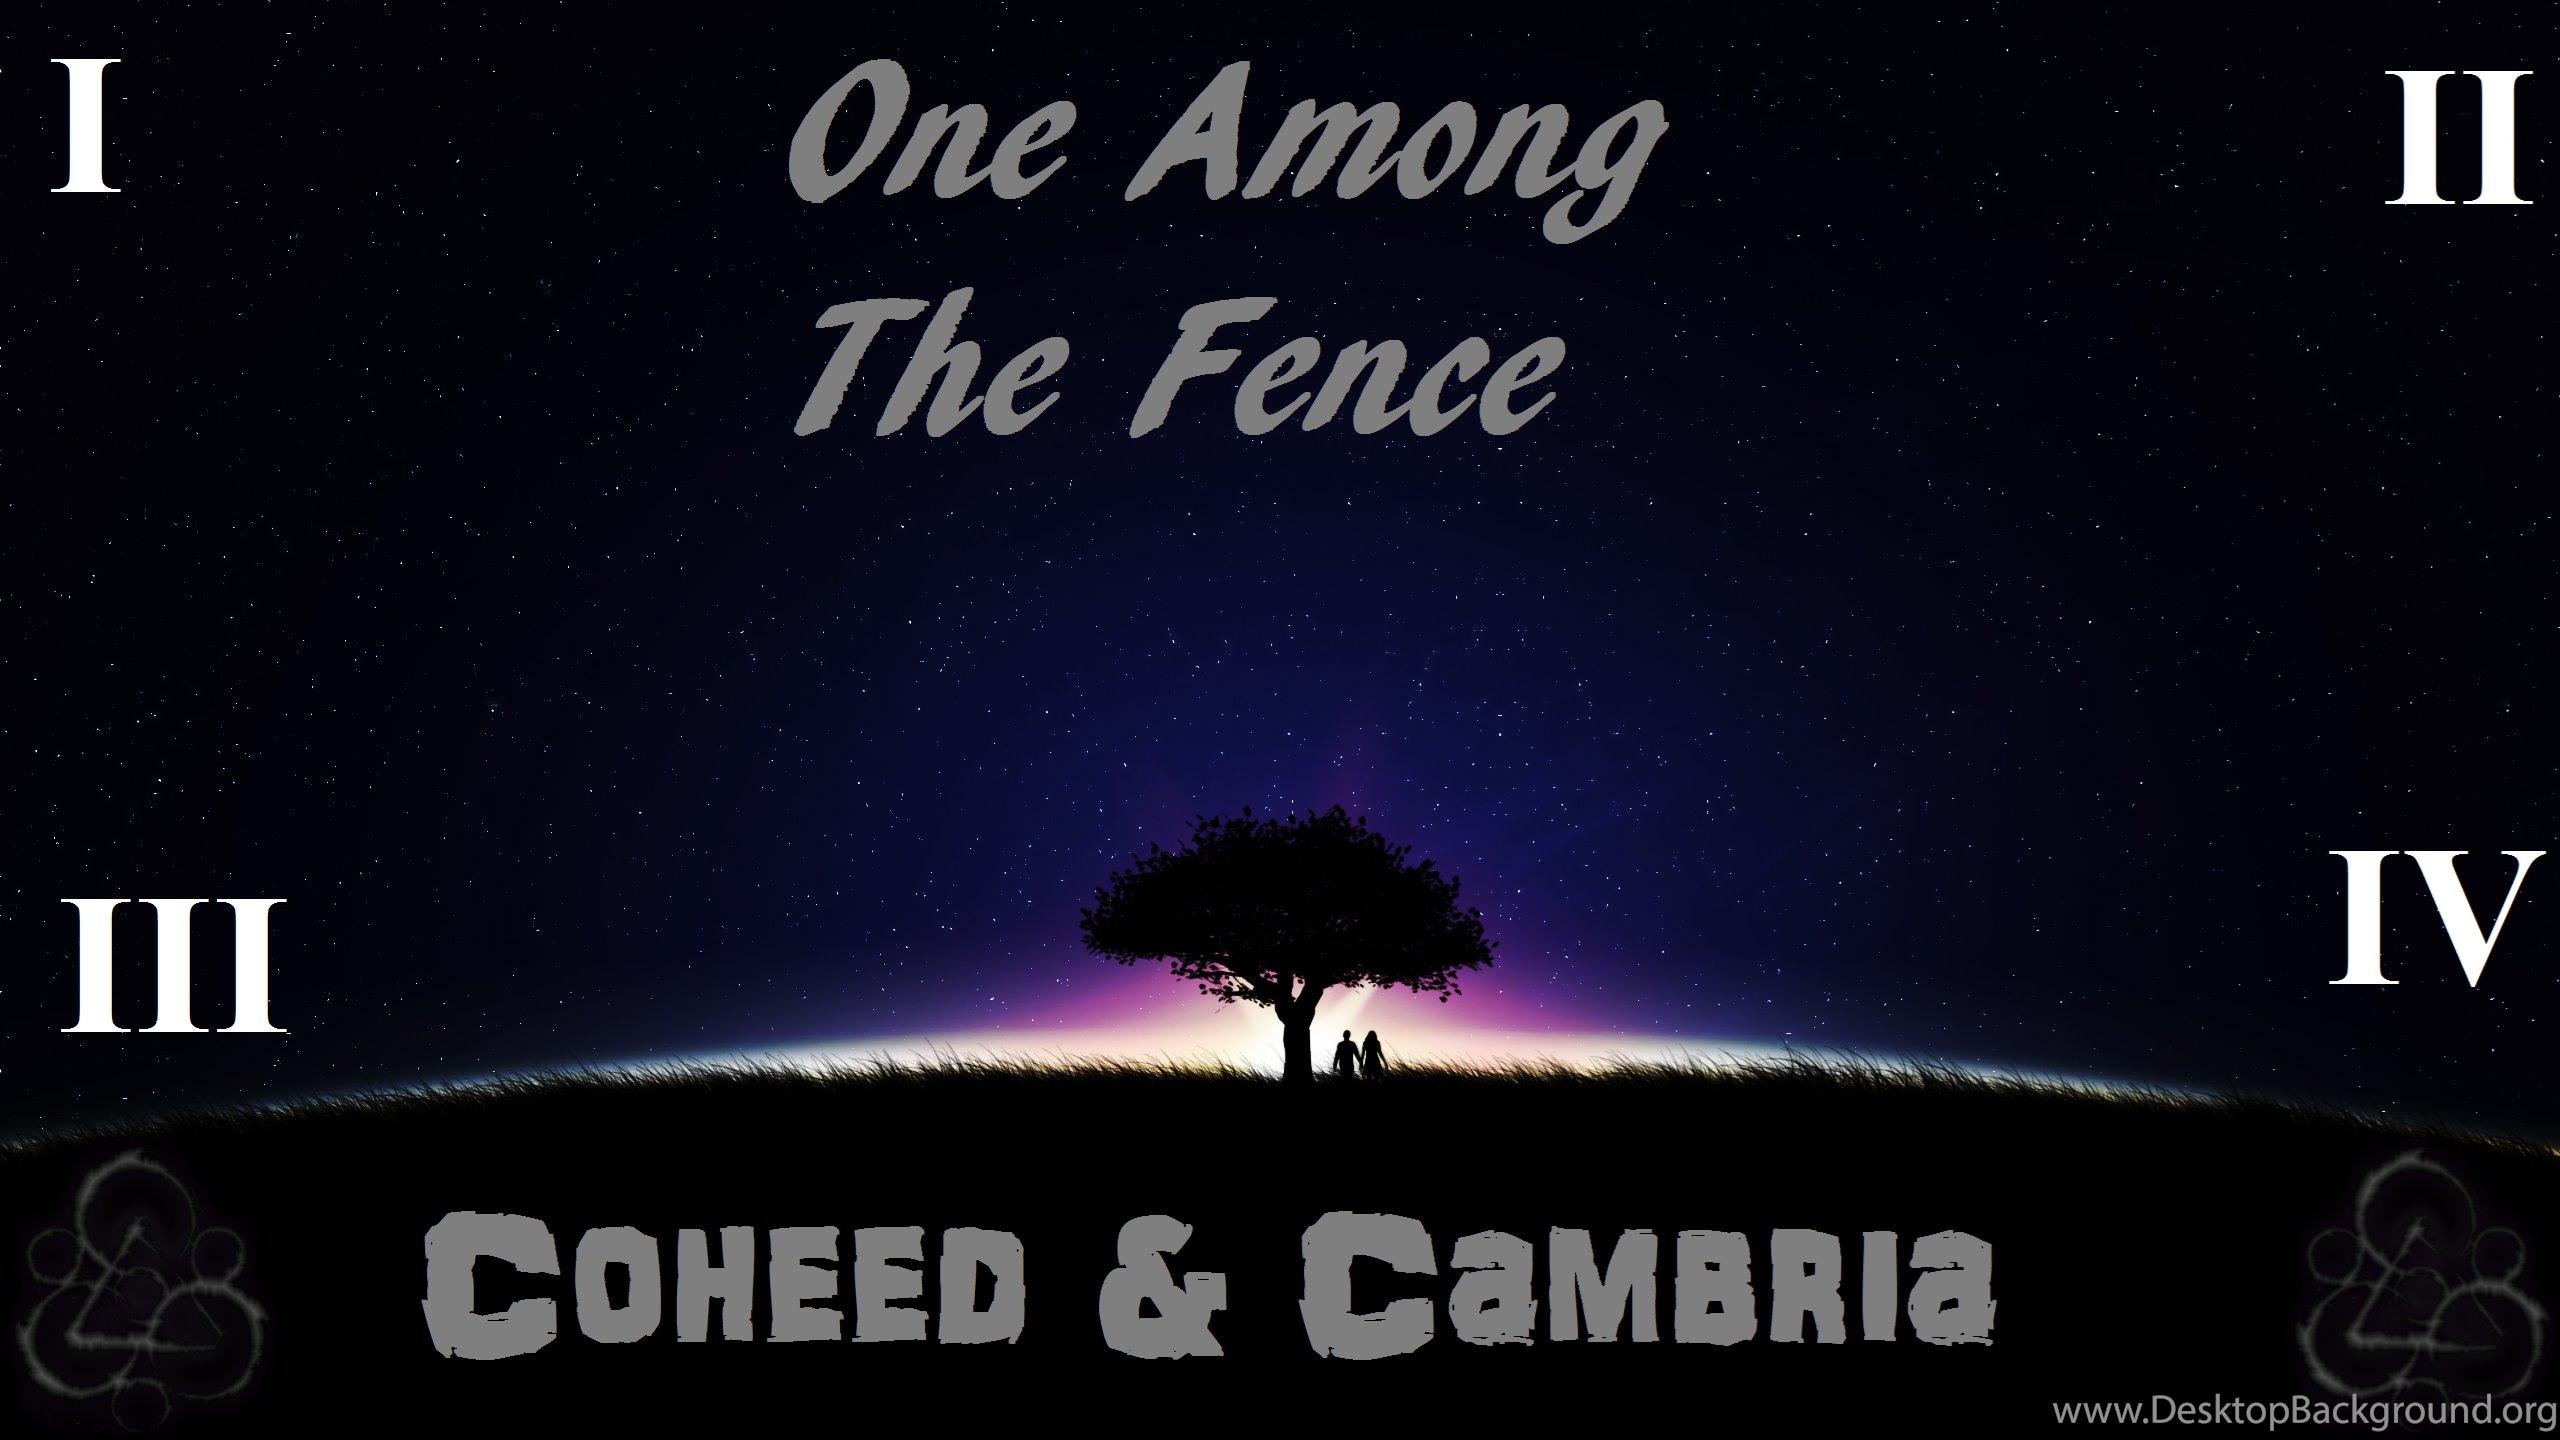 Coheed And Cambria Wallpapers By Sfxanima On Deviantart Desktop